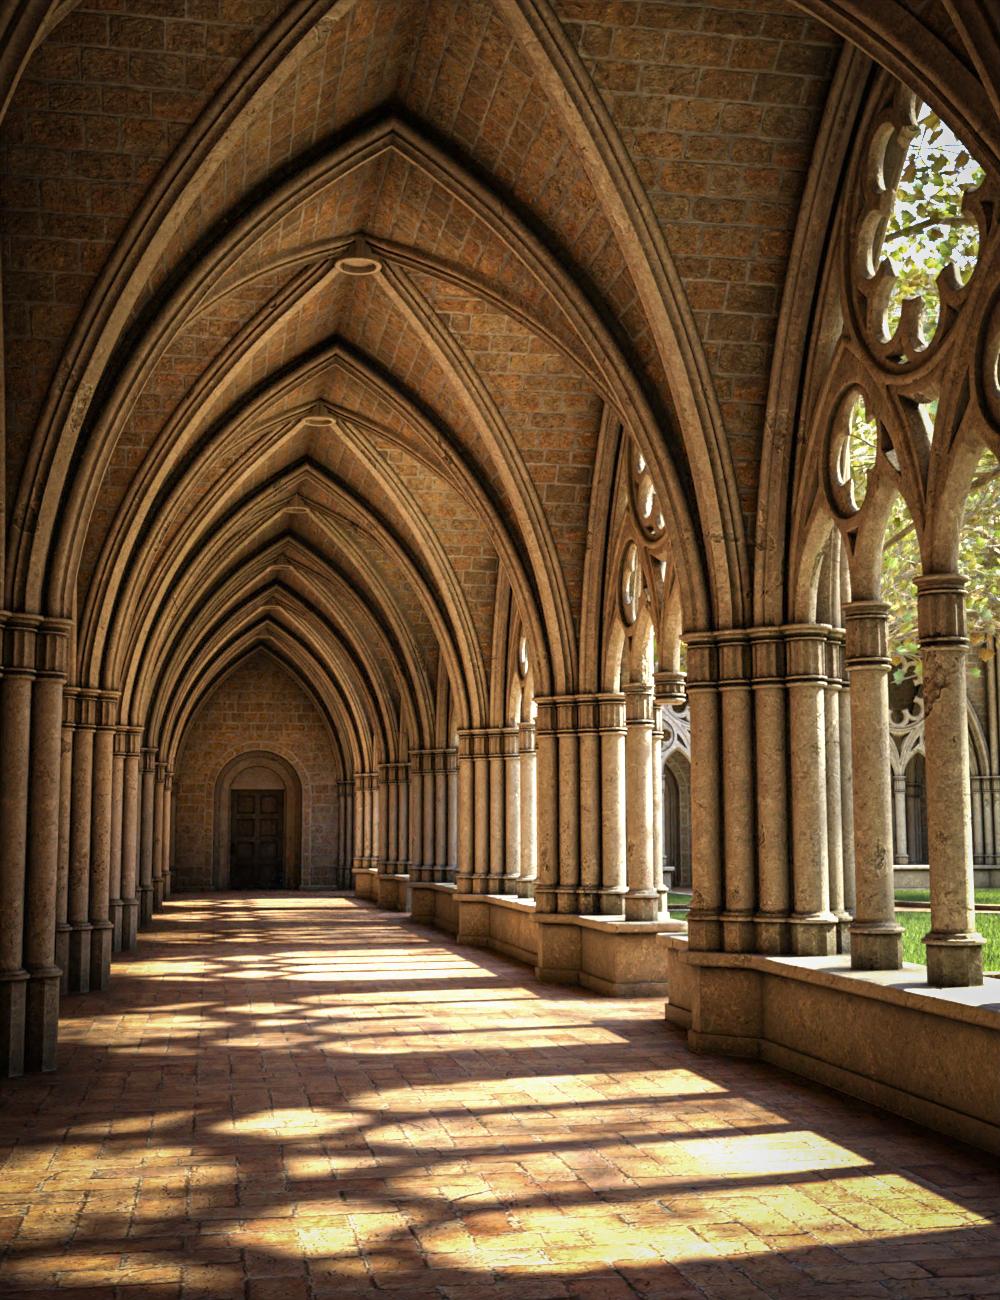 Gothic Courtyard by: SloshWerks, 3D Models by Daz 3D